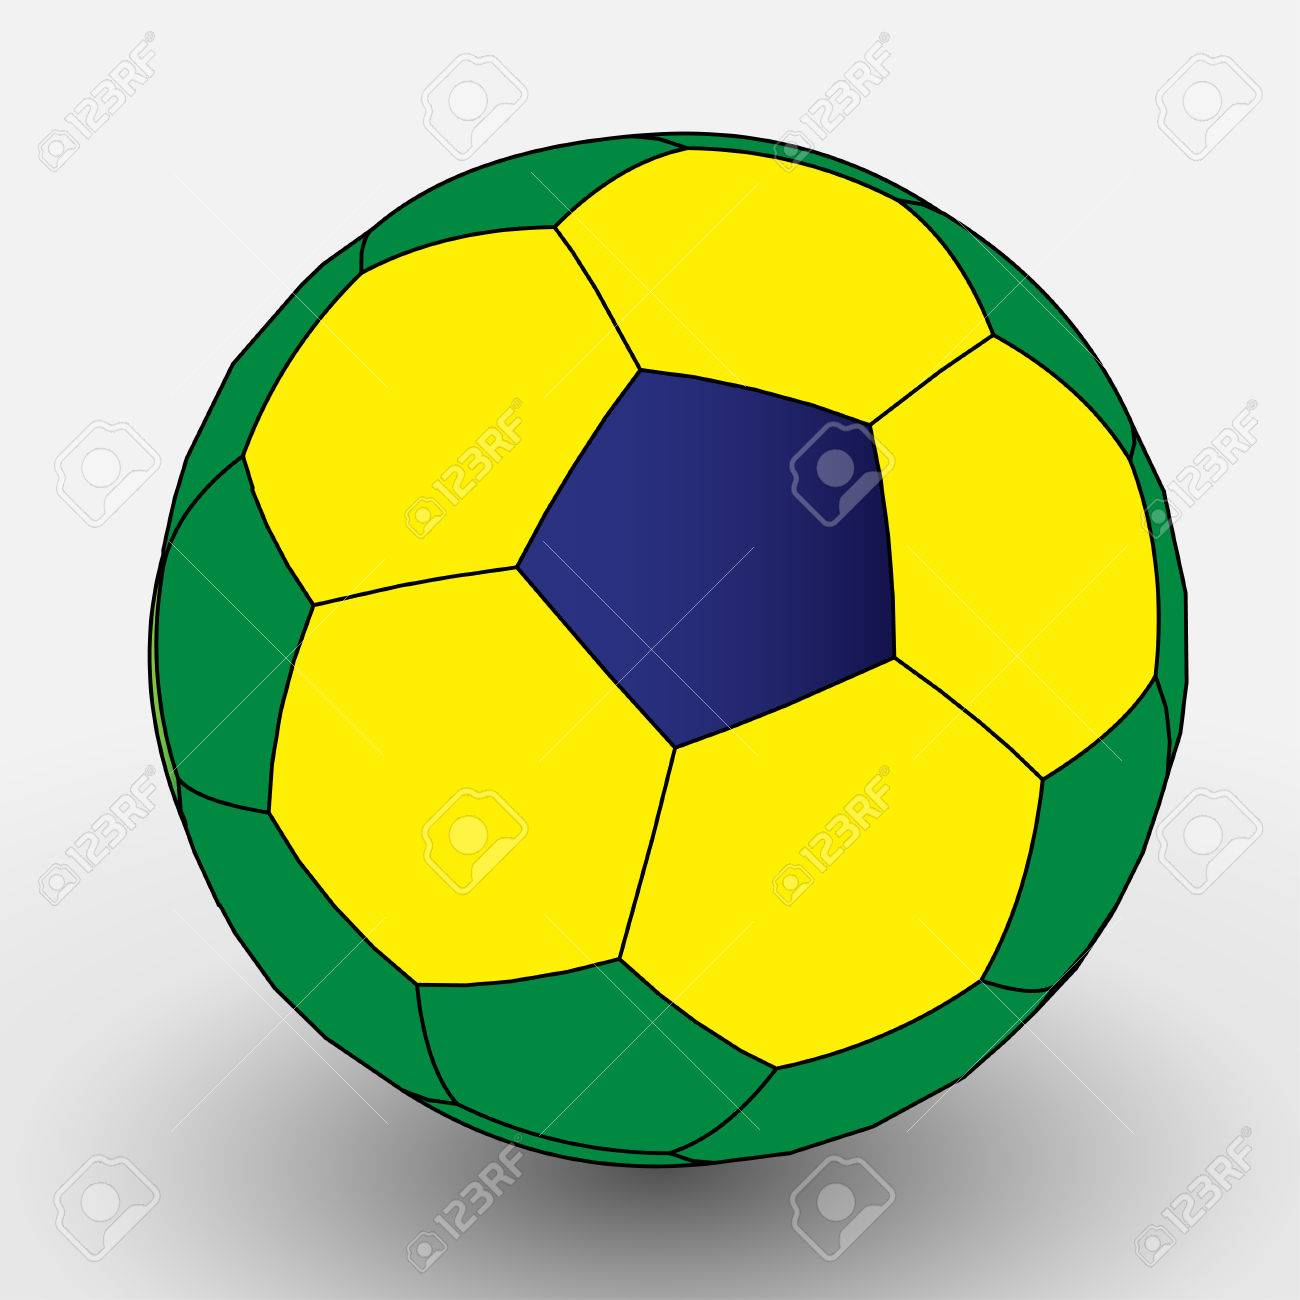 Flat Color Brazilian Soccer Ball EPS10 Vector - 51768760